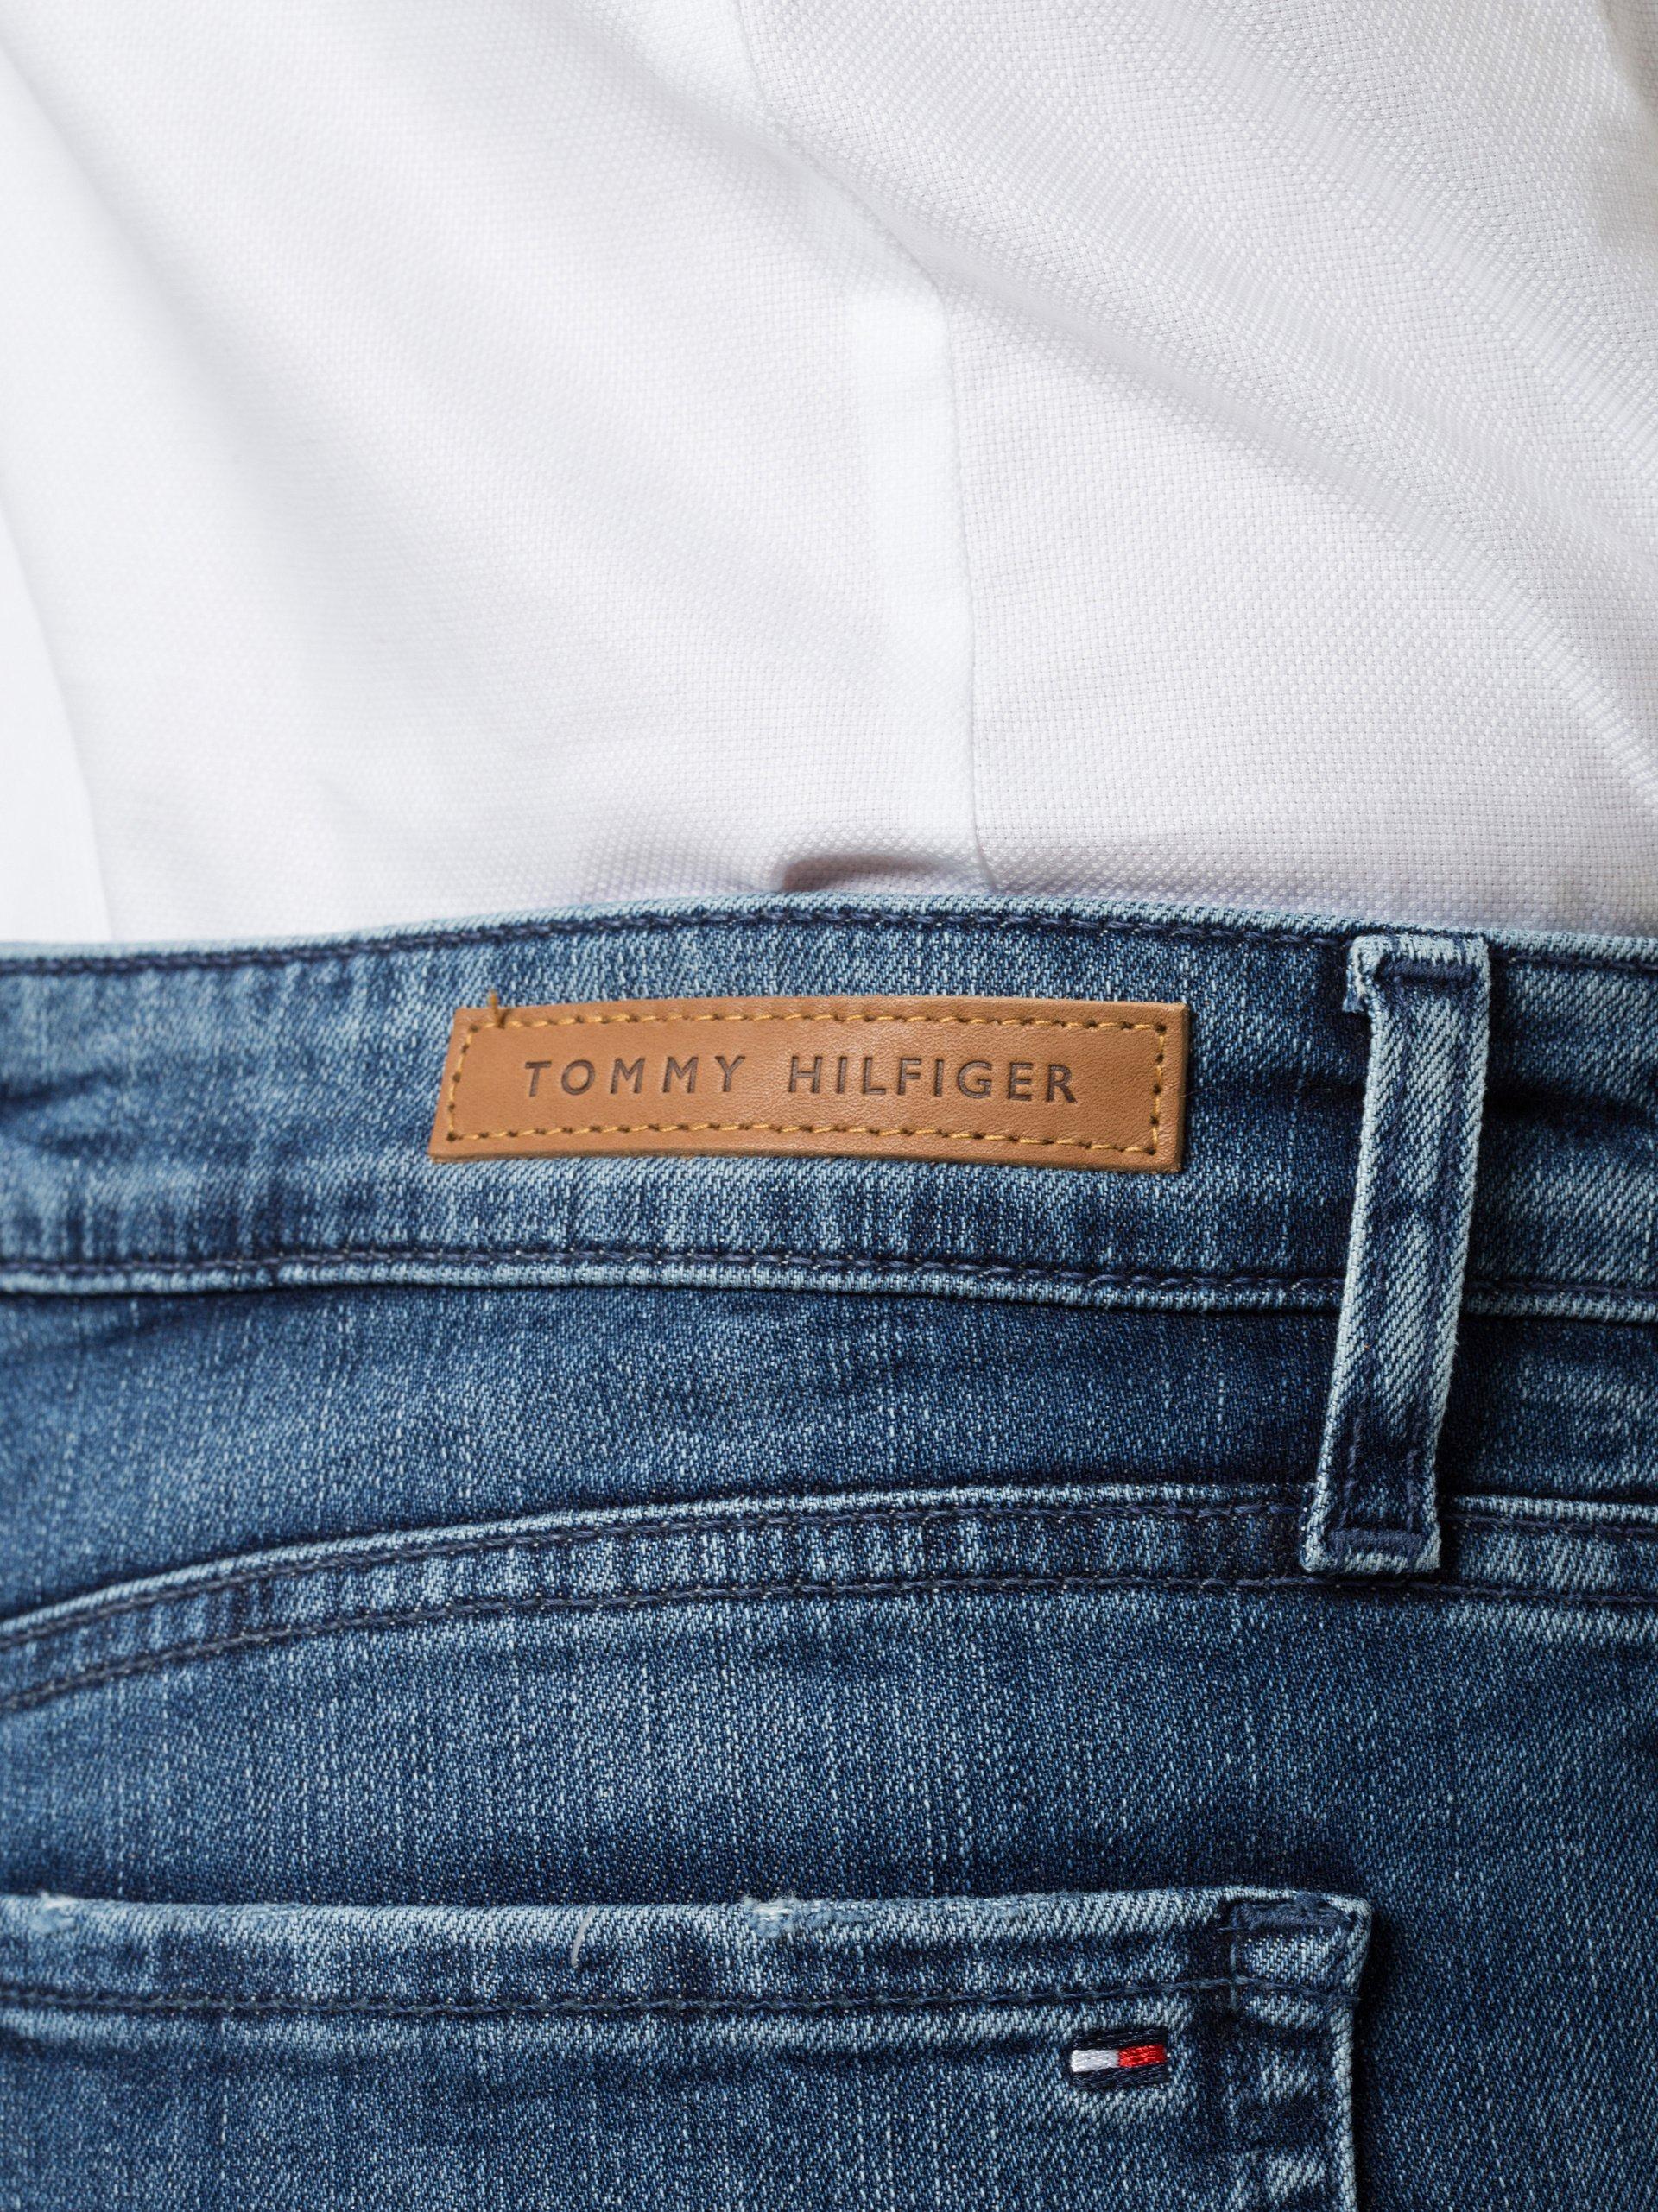 Tommy Hilfiger Damen Jeans